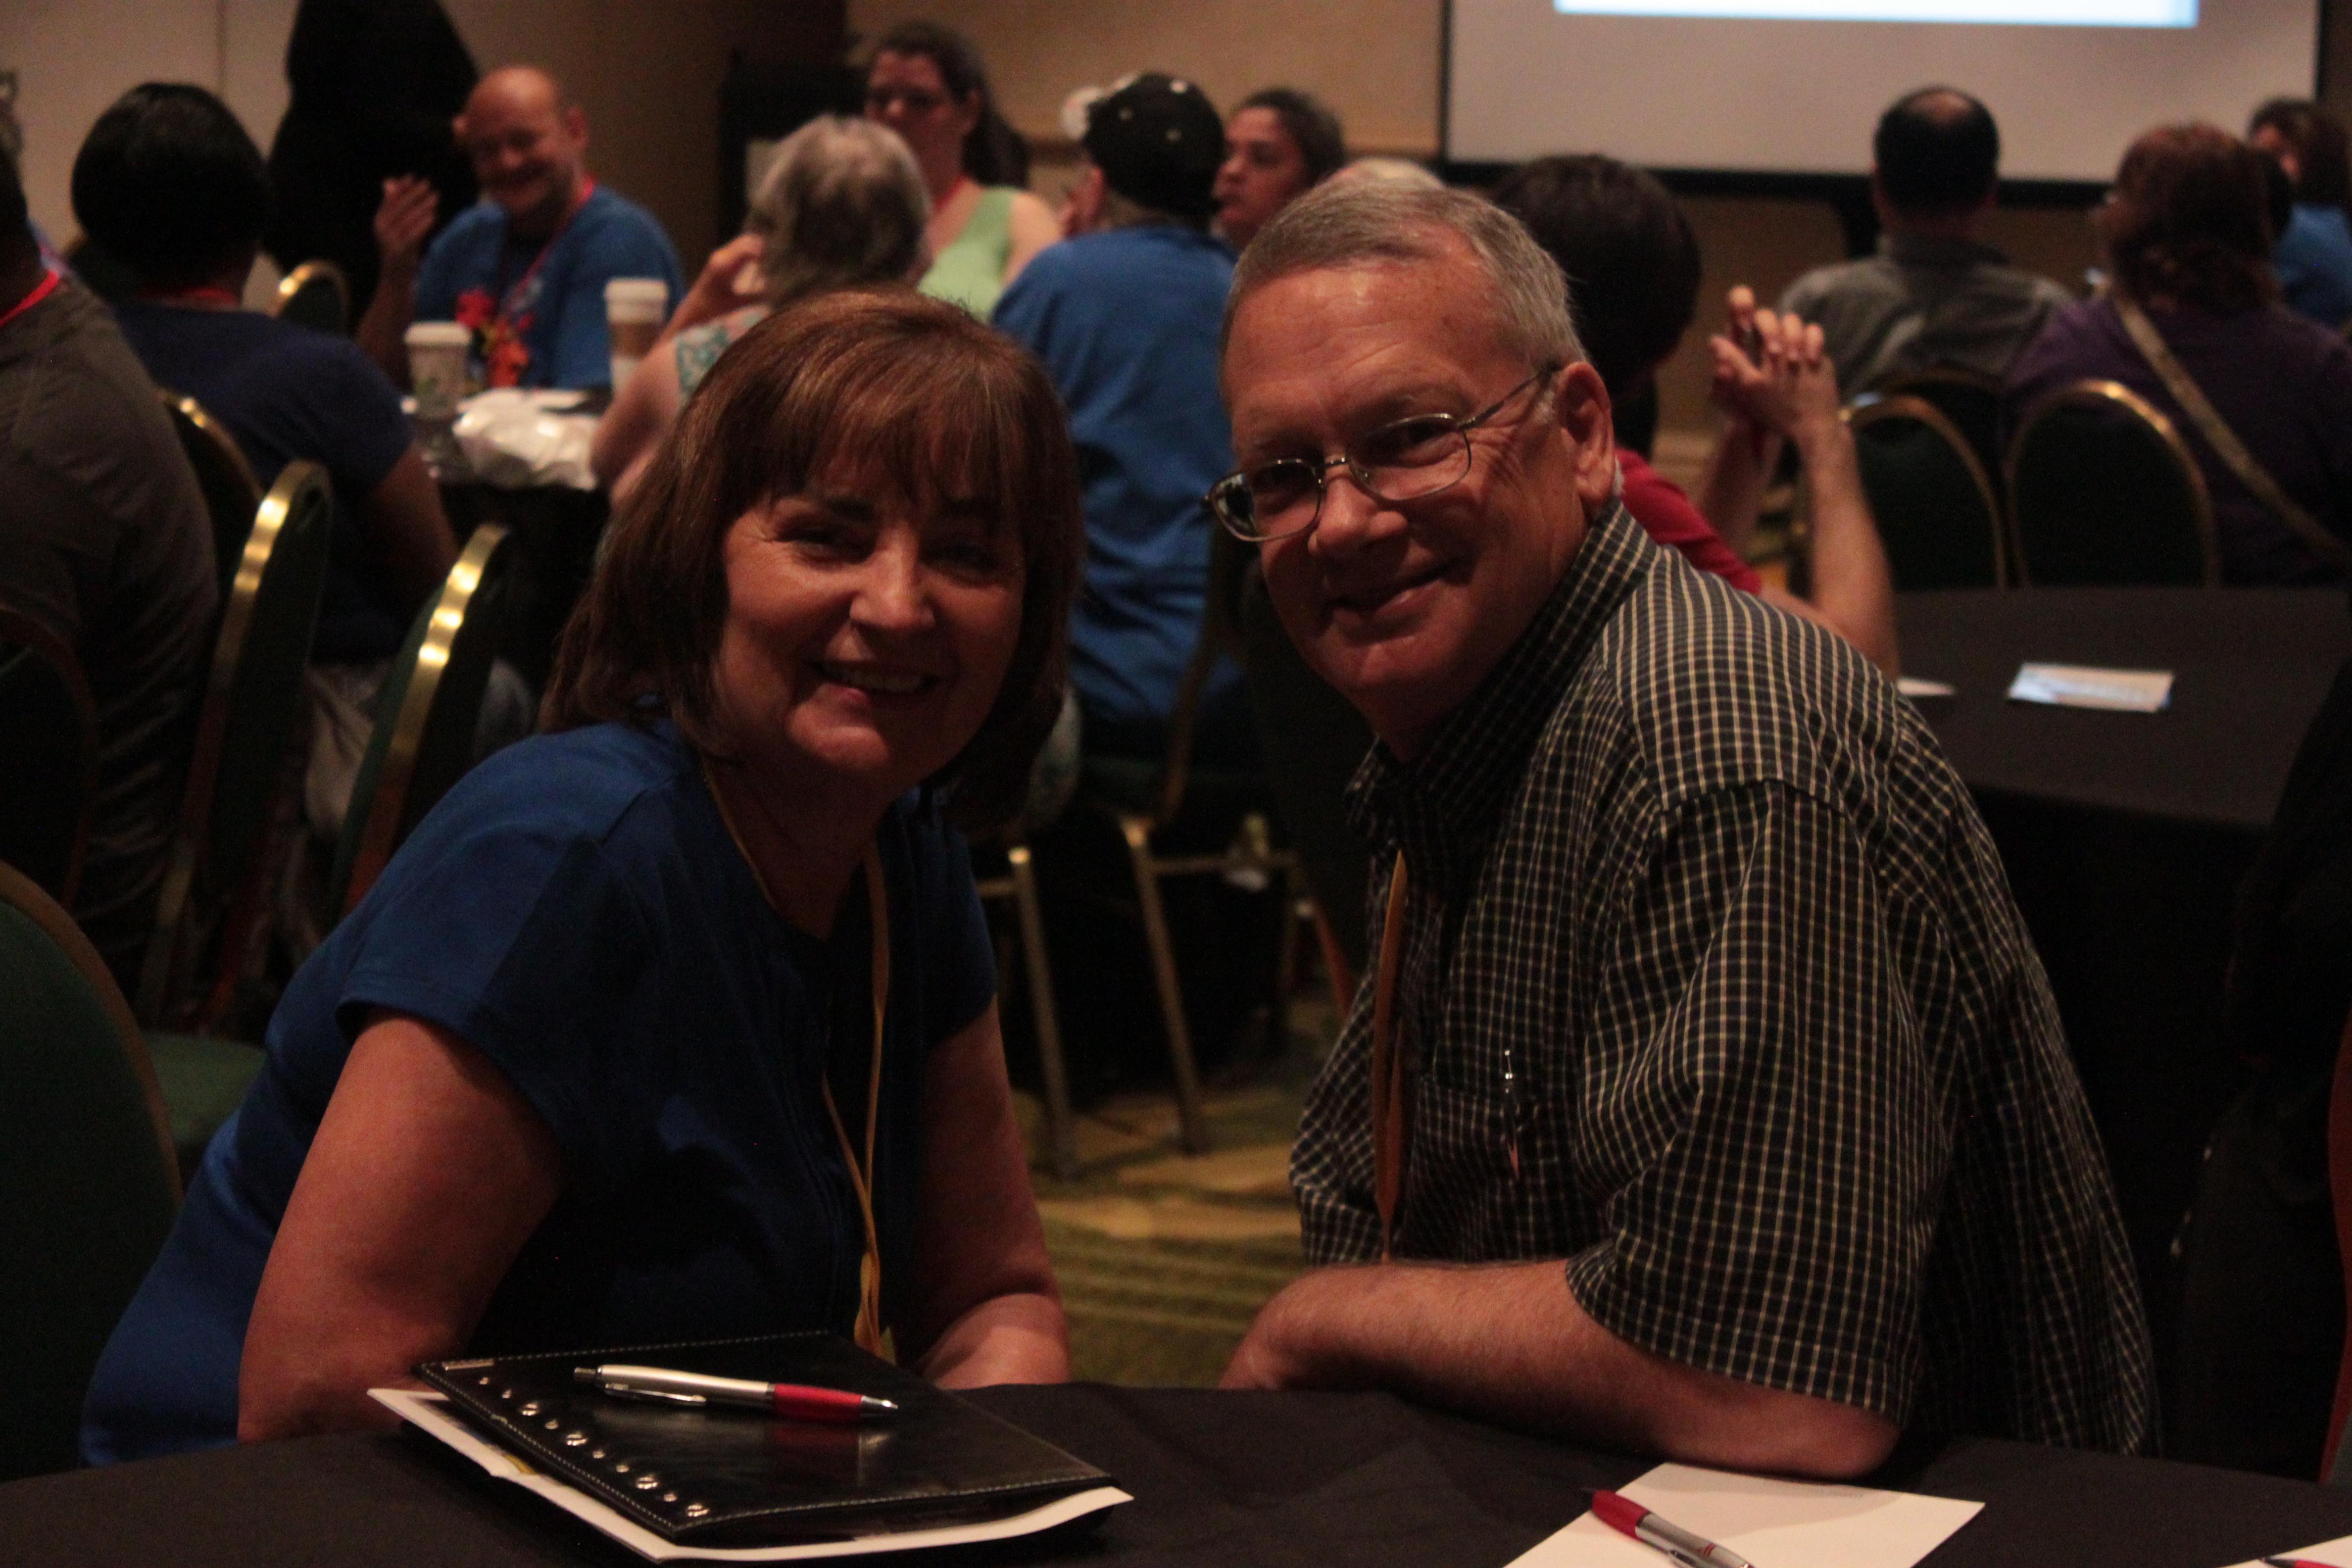 TCAC Board Members Edna Potts and Jim Wilson